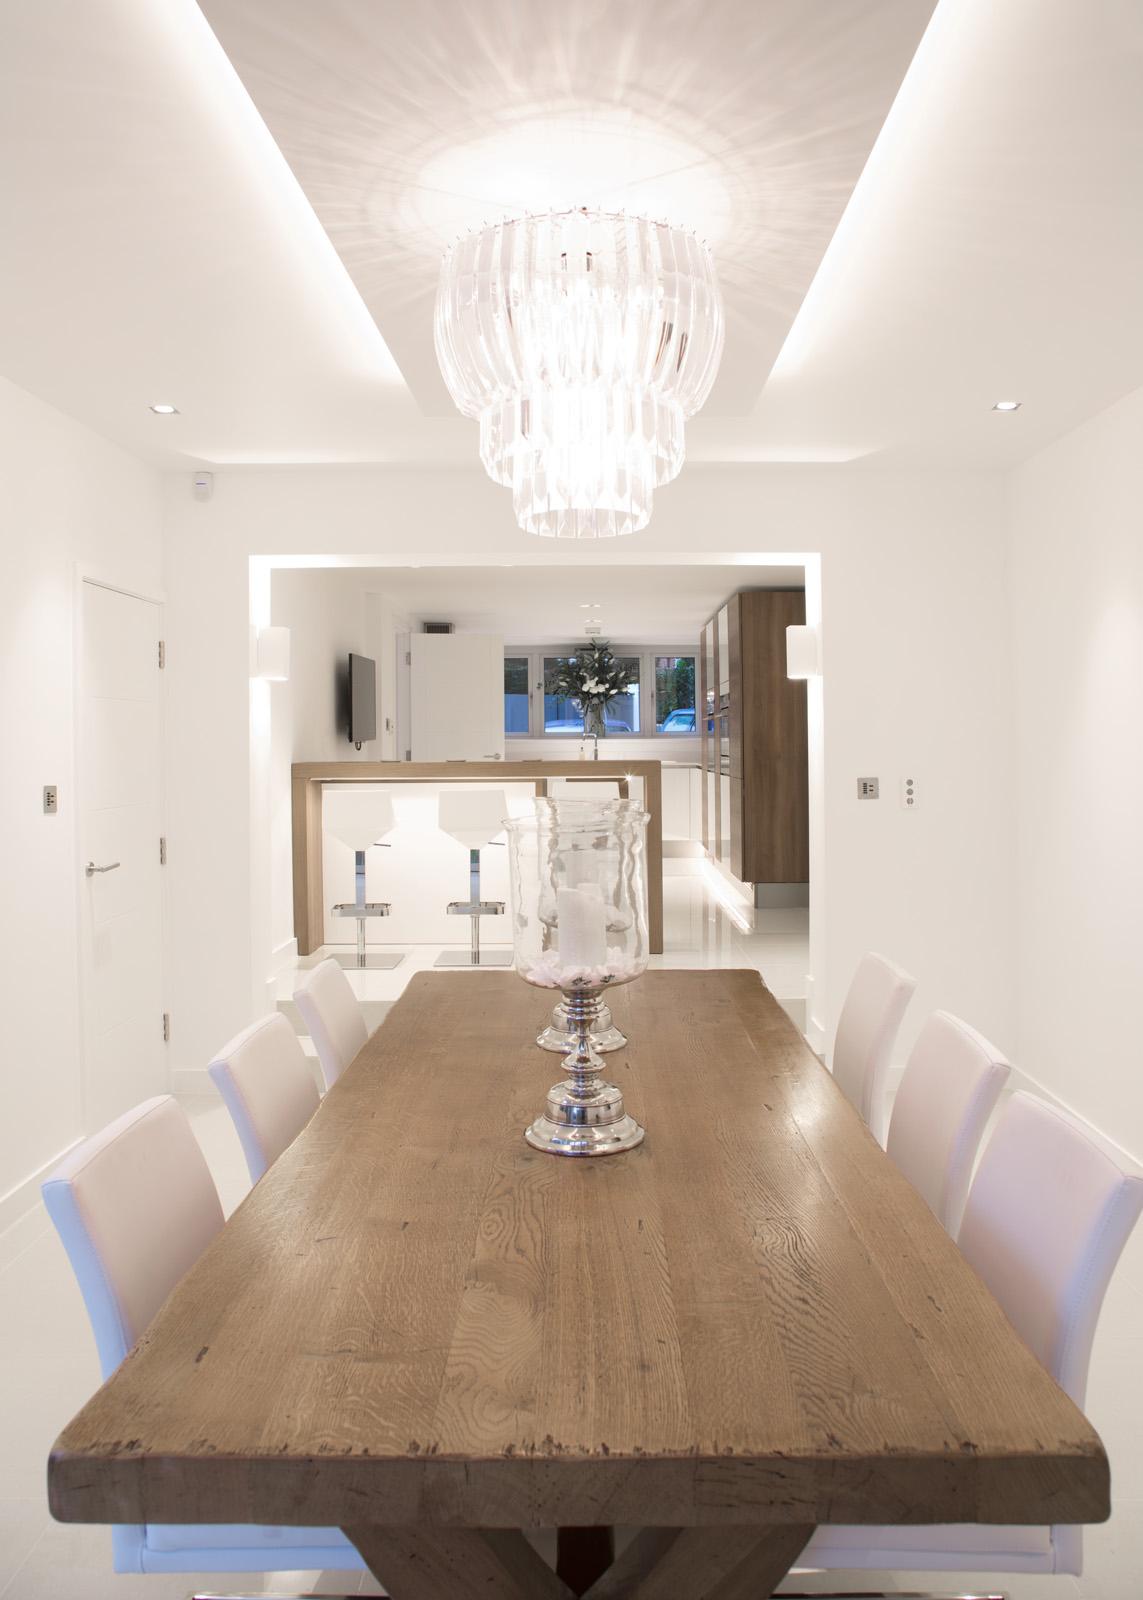 Client: The Lighting Design Studio